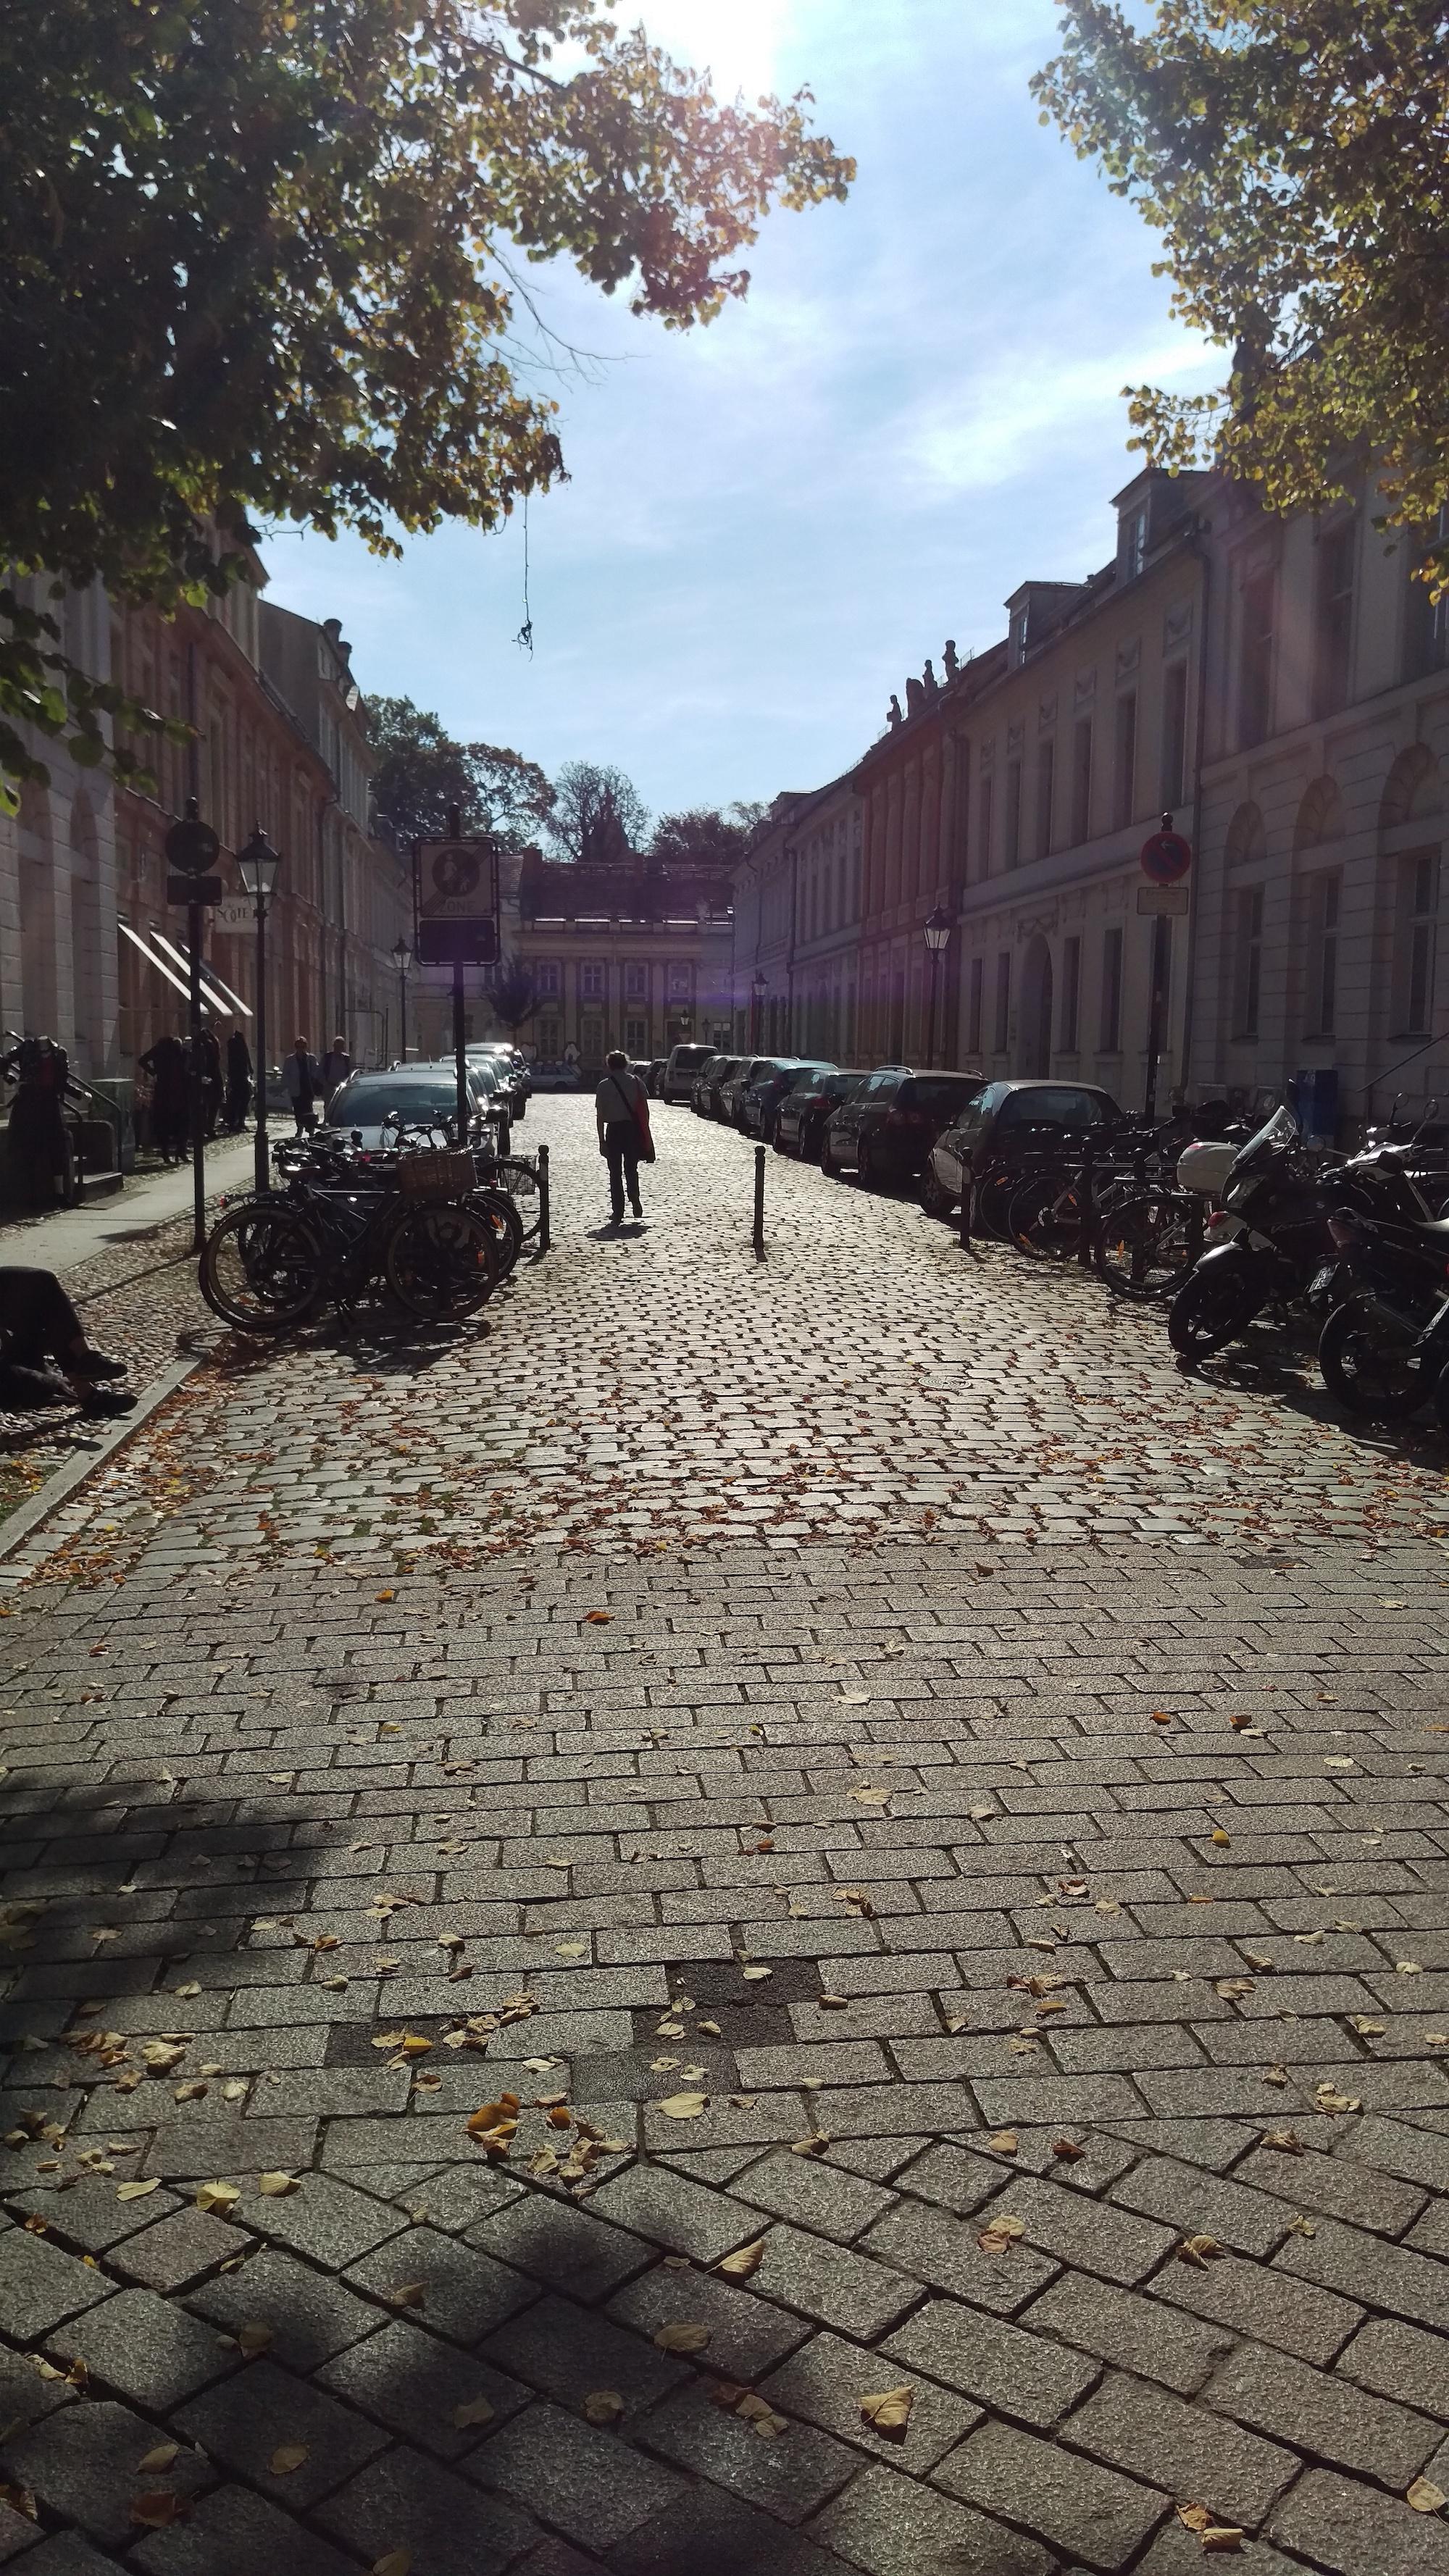 Narrow cobblestone streets in the Potsdam Ol town neighborhood.